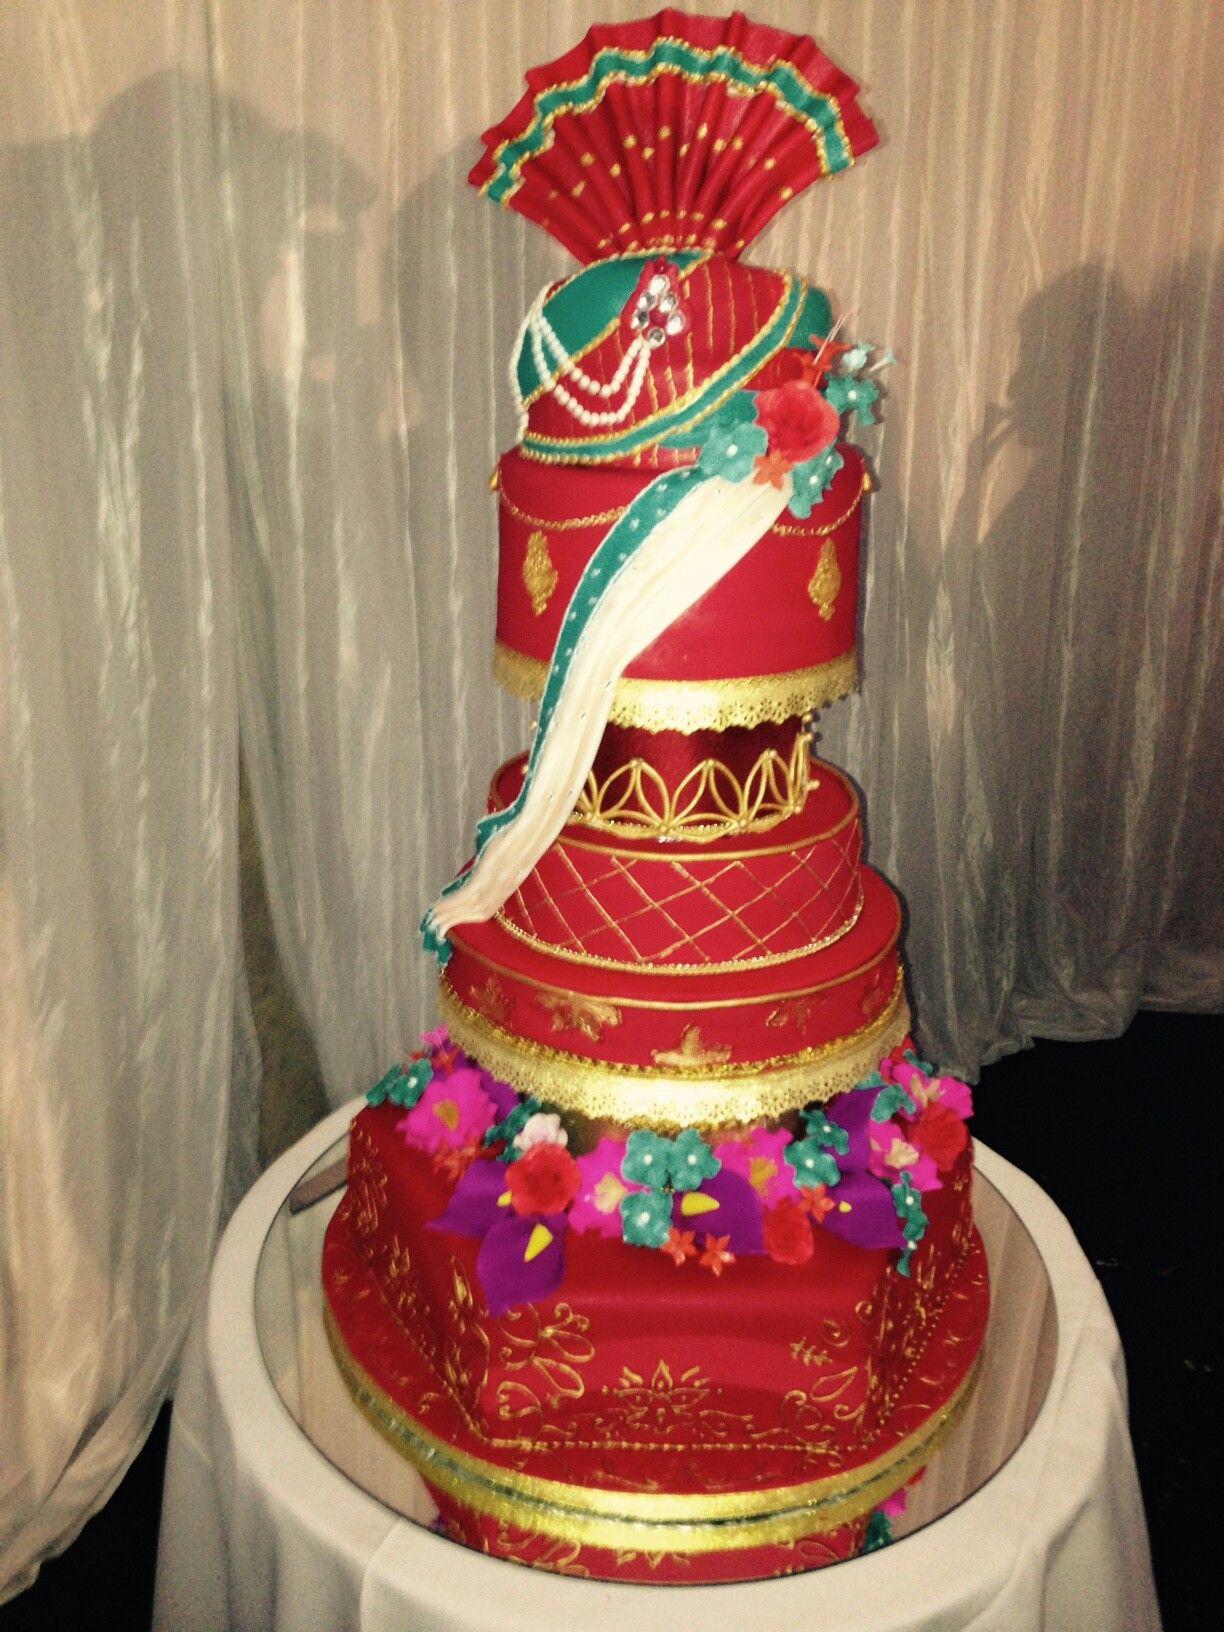 Traditional Indian Wedding Cake The Cake House Pietermaritzburg